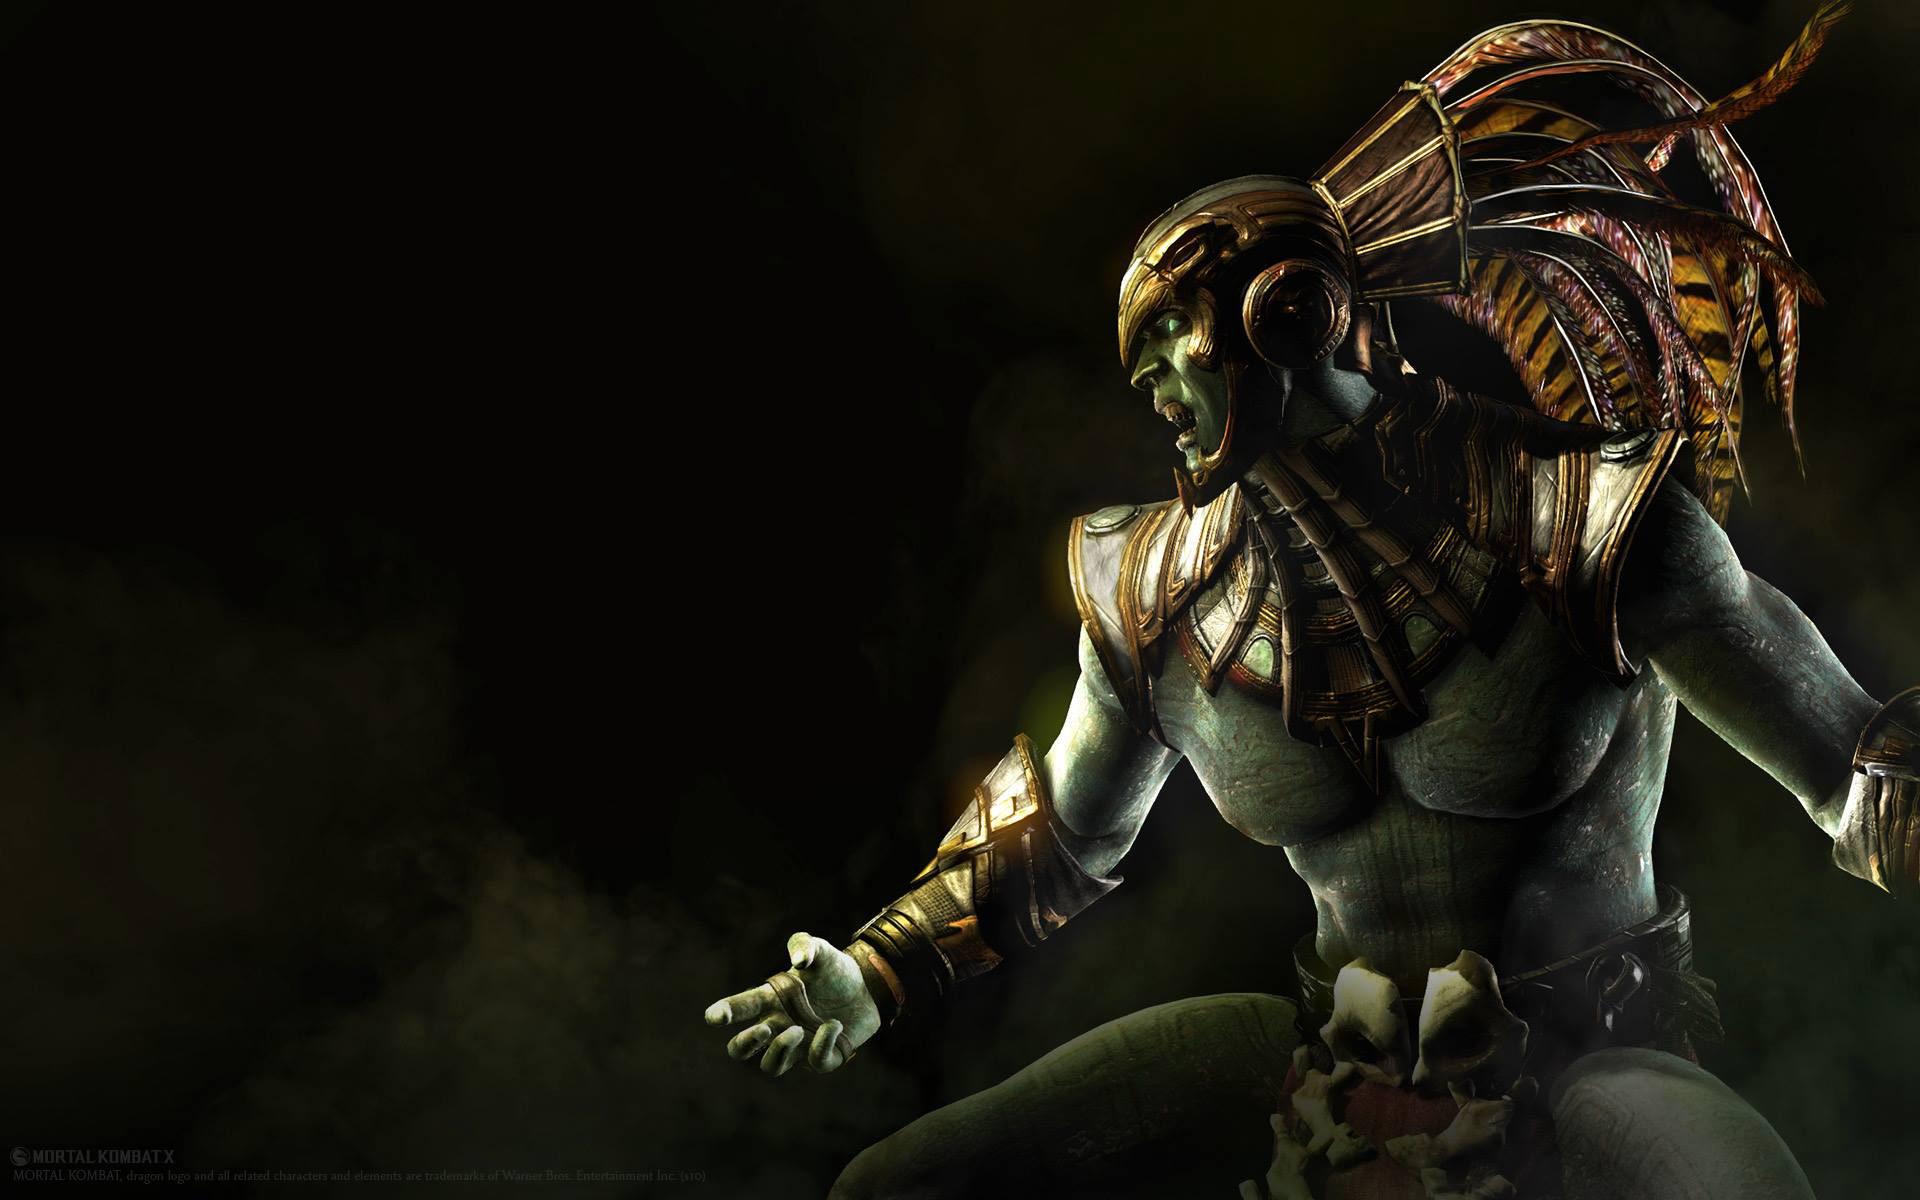 Mortal Kombat X Character Artwork